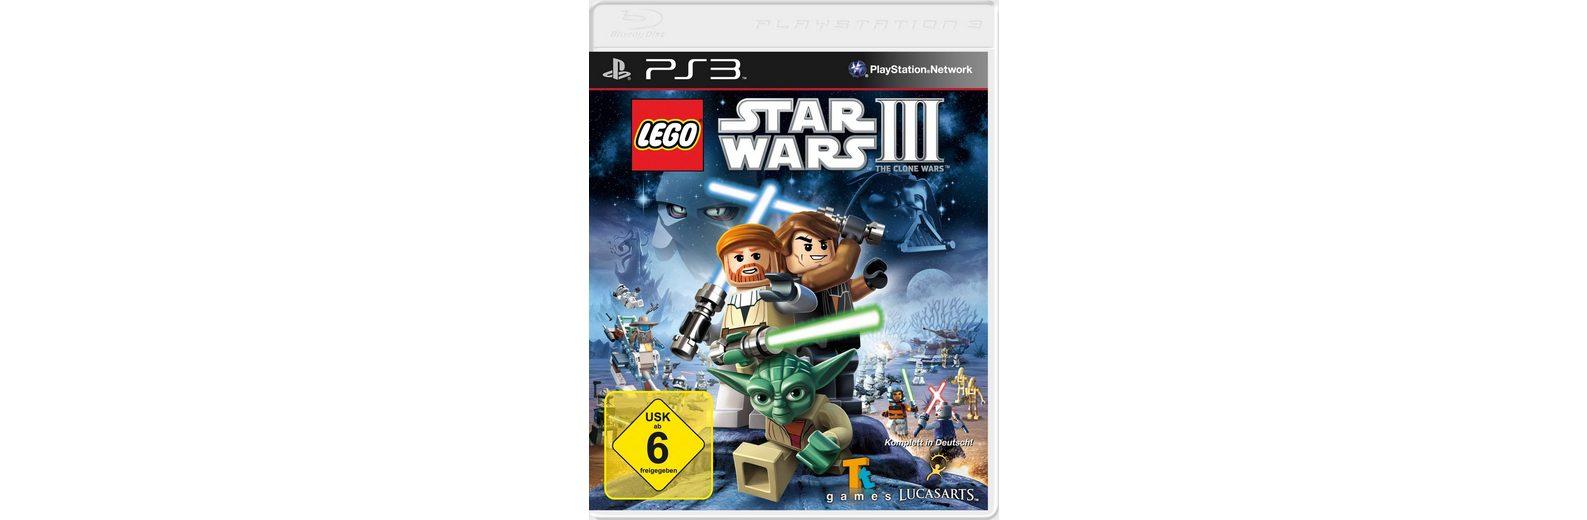 DISNEY Software Pyramide - Playstation 3 Spiel »LEGO Star Wars 3: The Clone Wars«